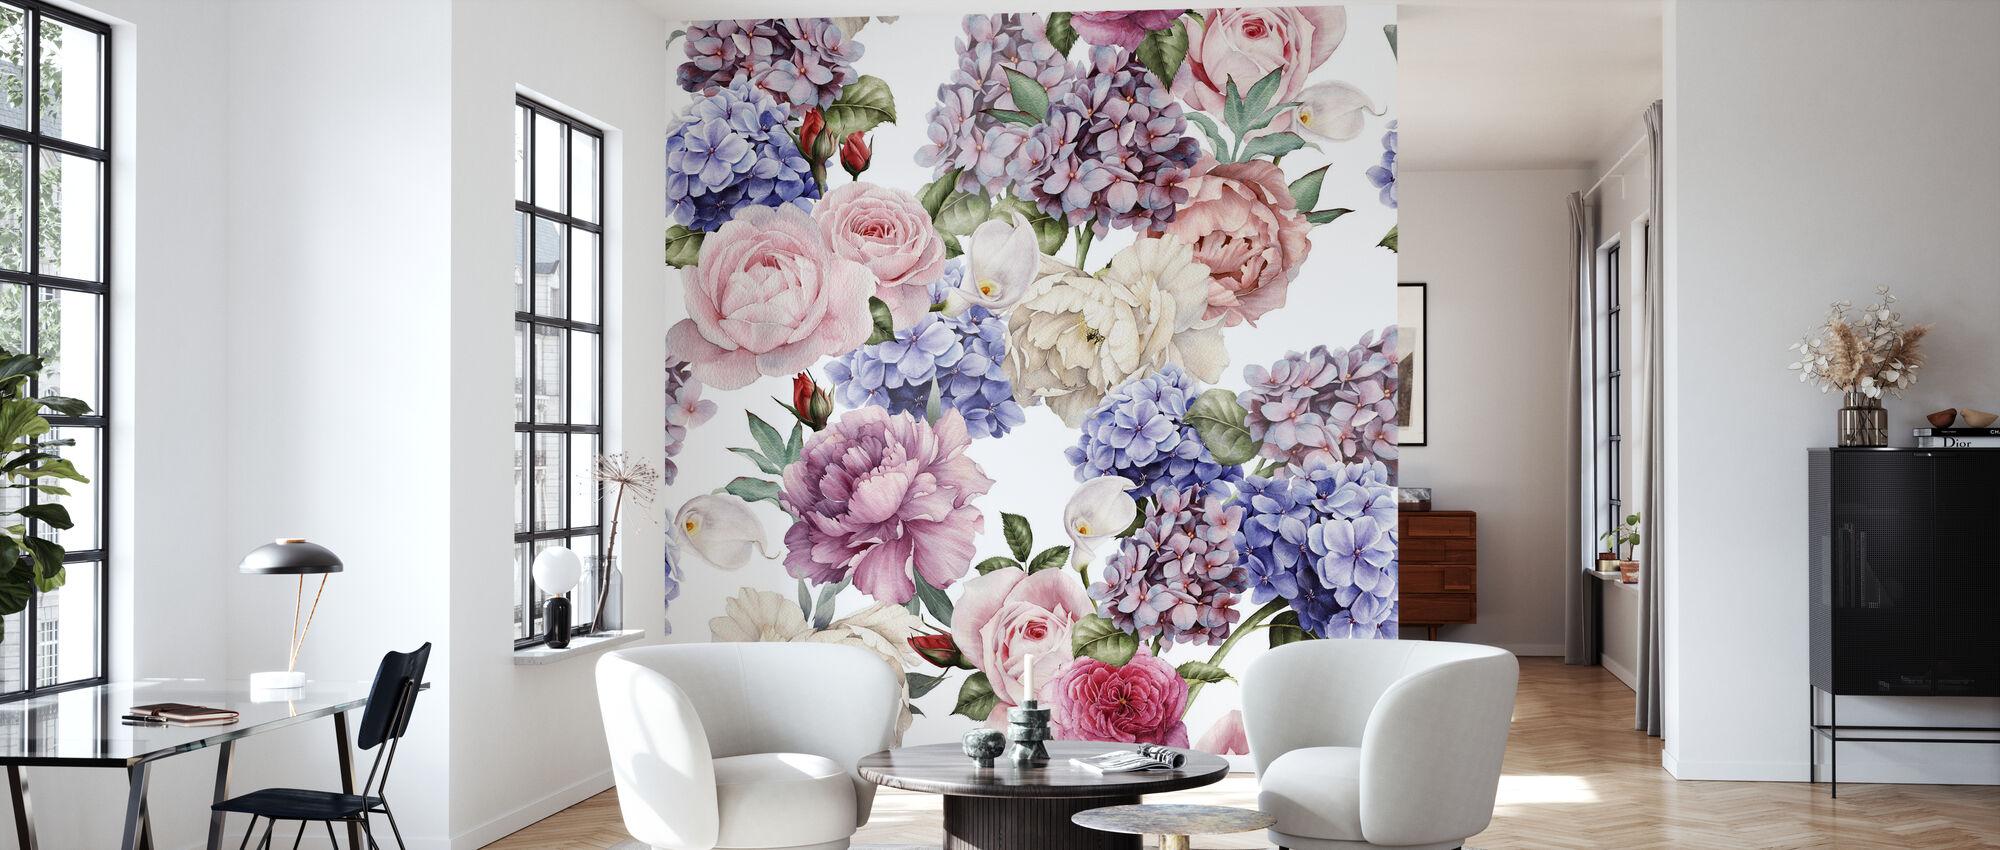 Endless Summer - Wallpaper - Living Room